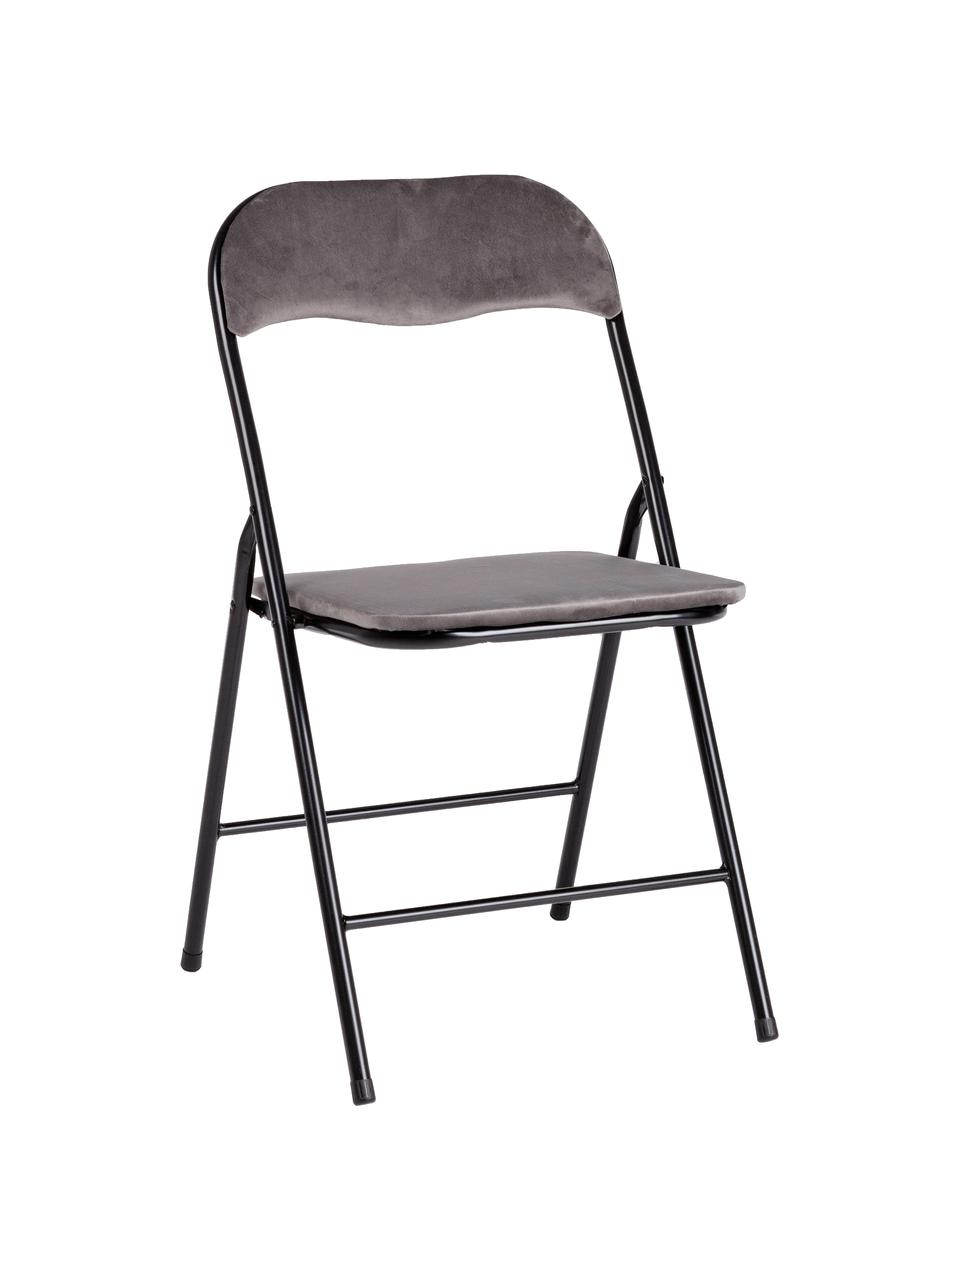 Chaise pliante en veloursAmal, Gris